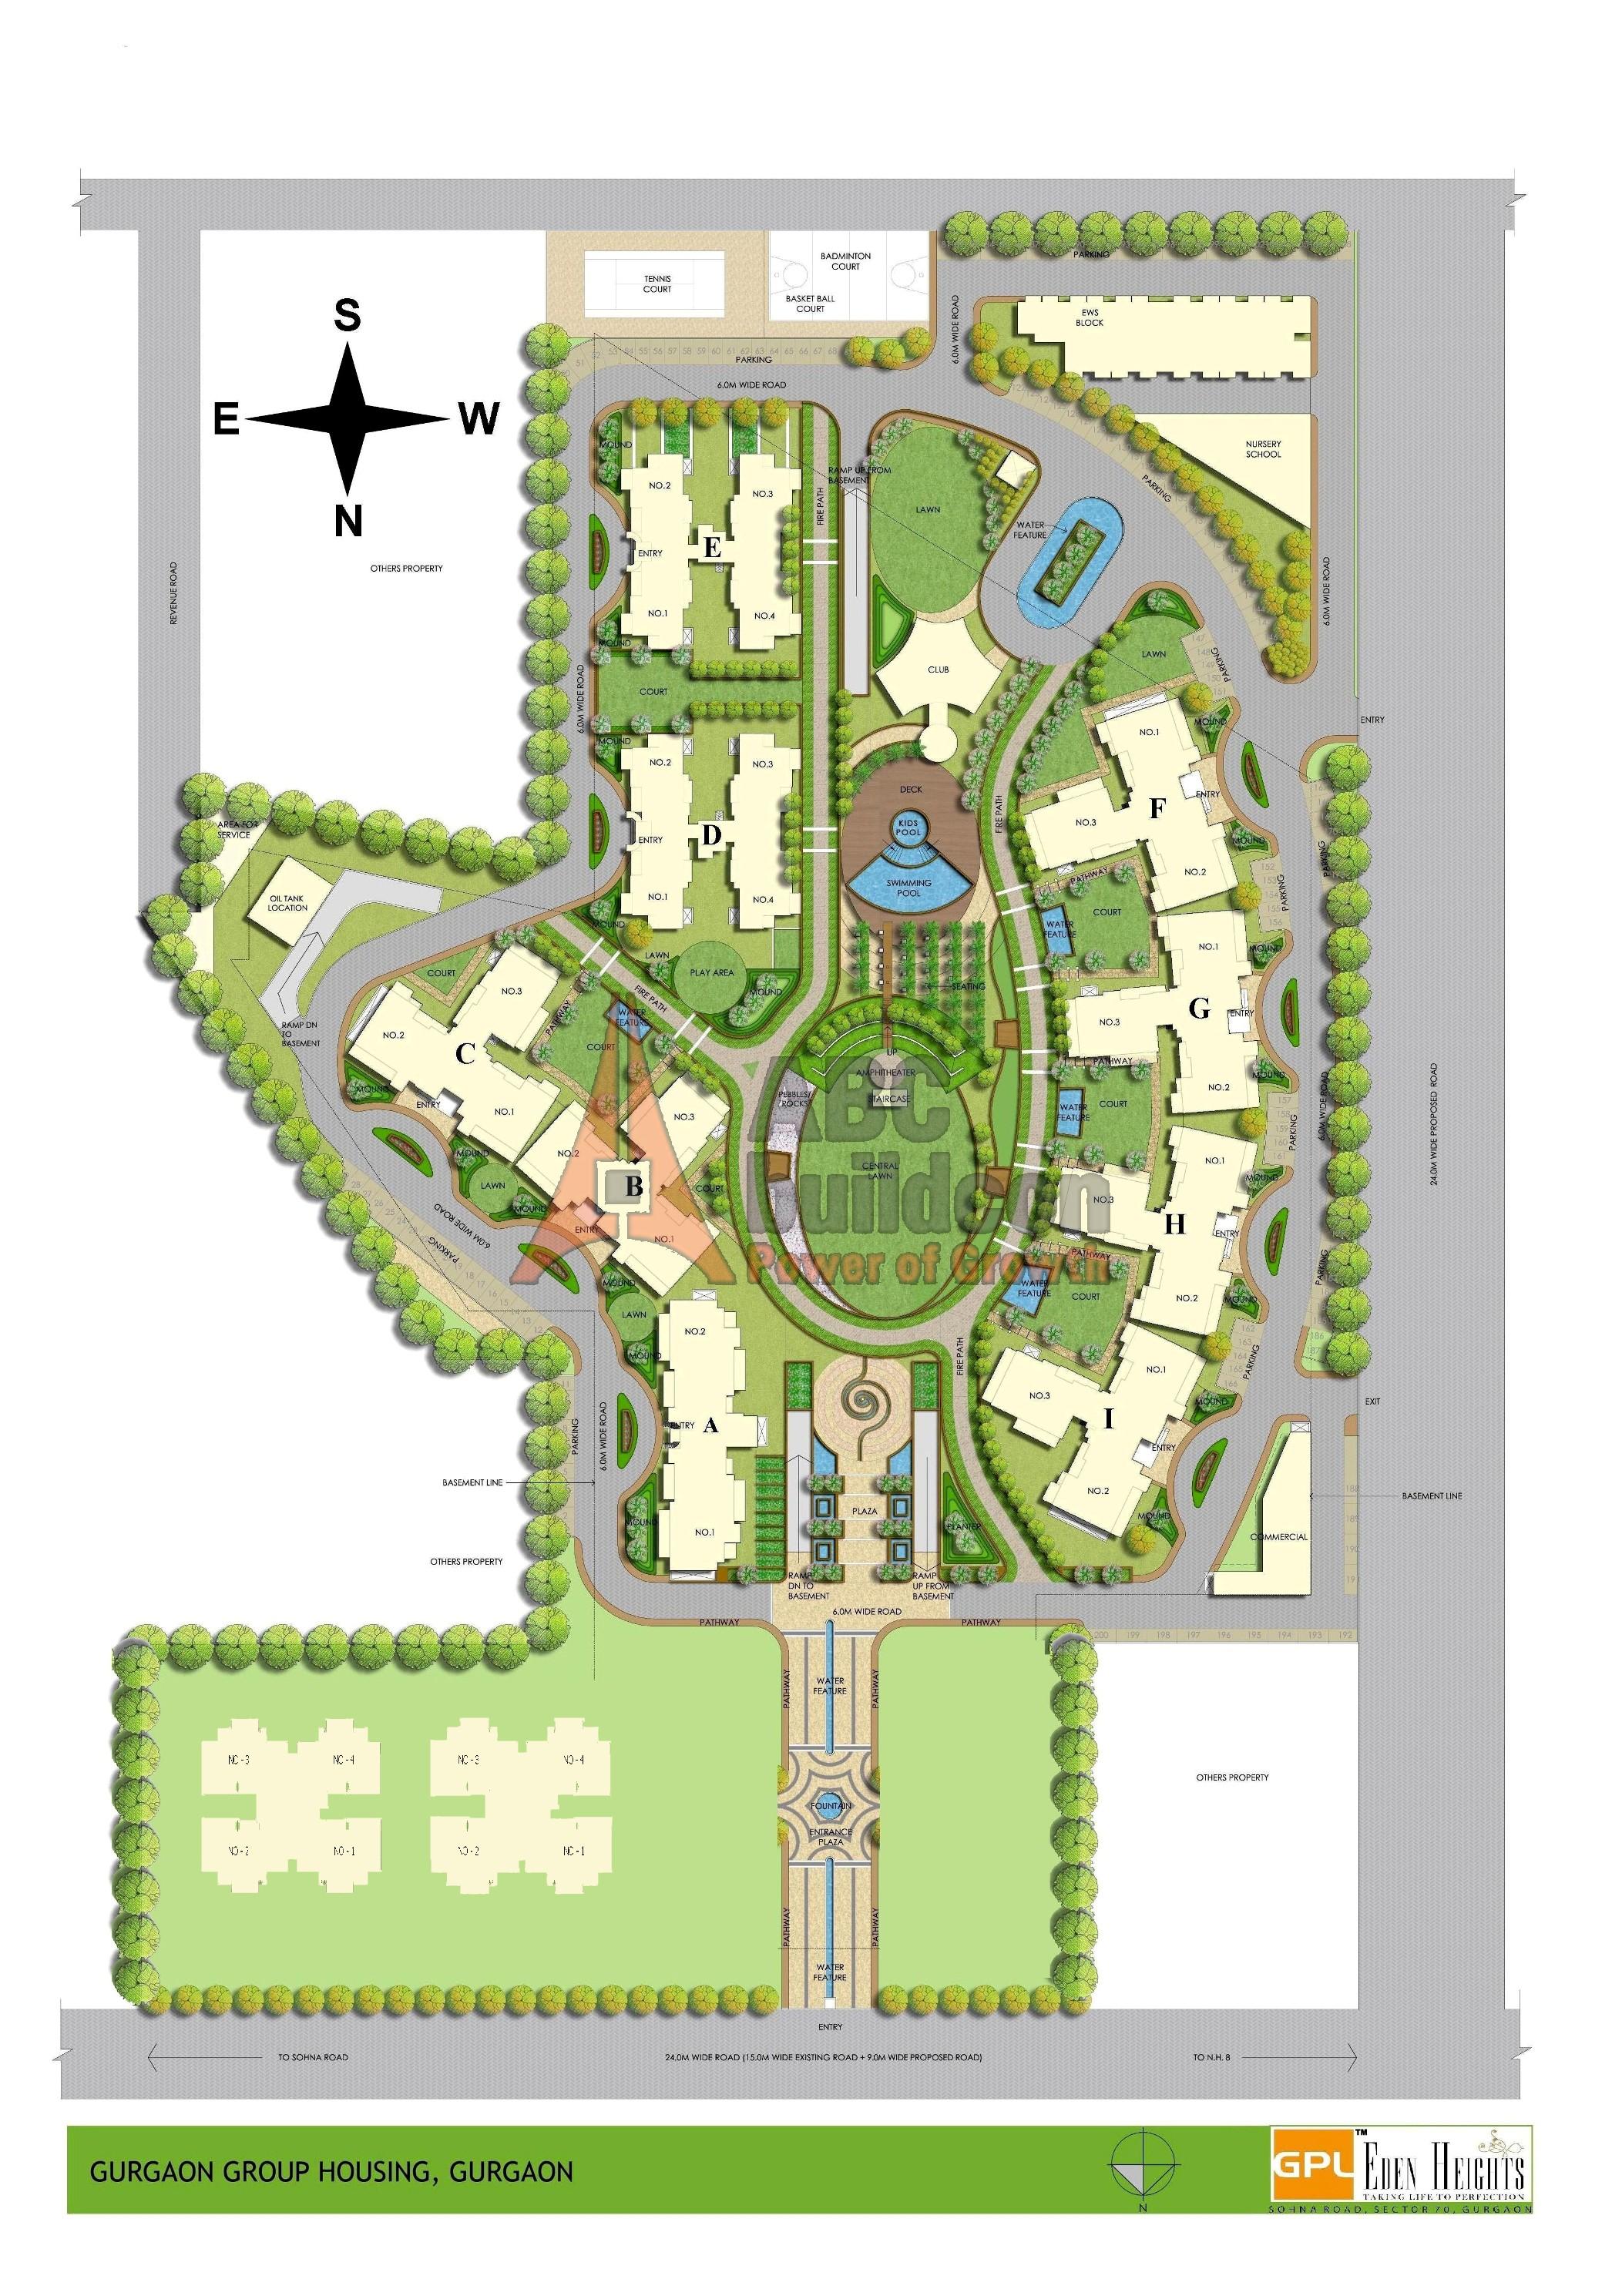 Gpl eden heights sector 70 gurgaon for Website build project plan